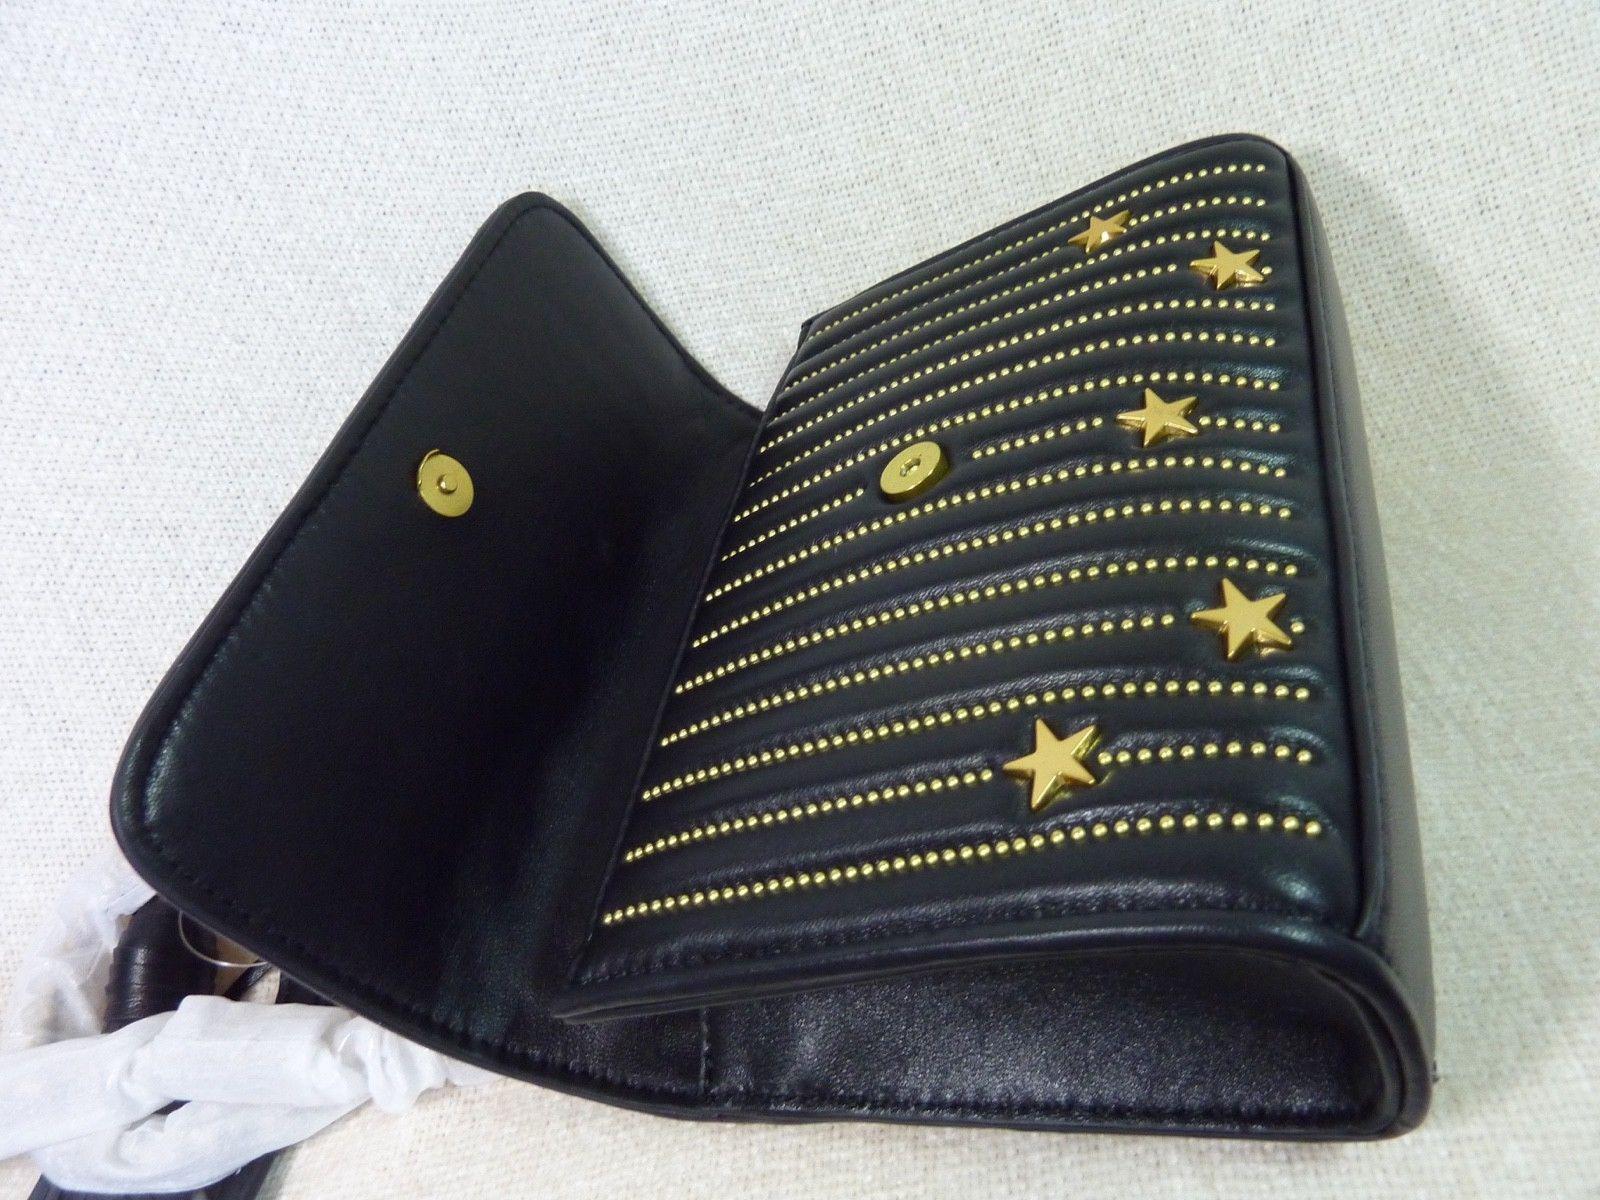 NWT Tory Burch Black Fleming Star-Stud Small Convertible Bag image 5